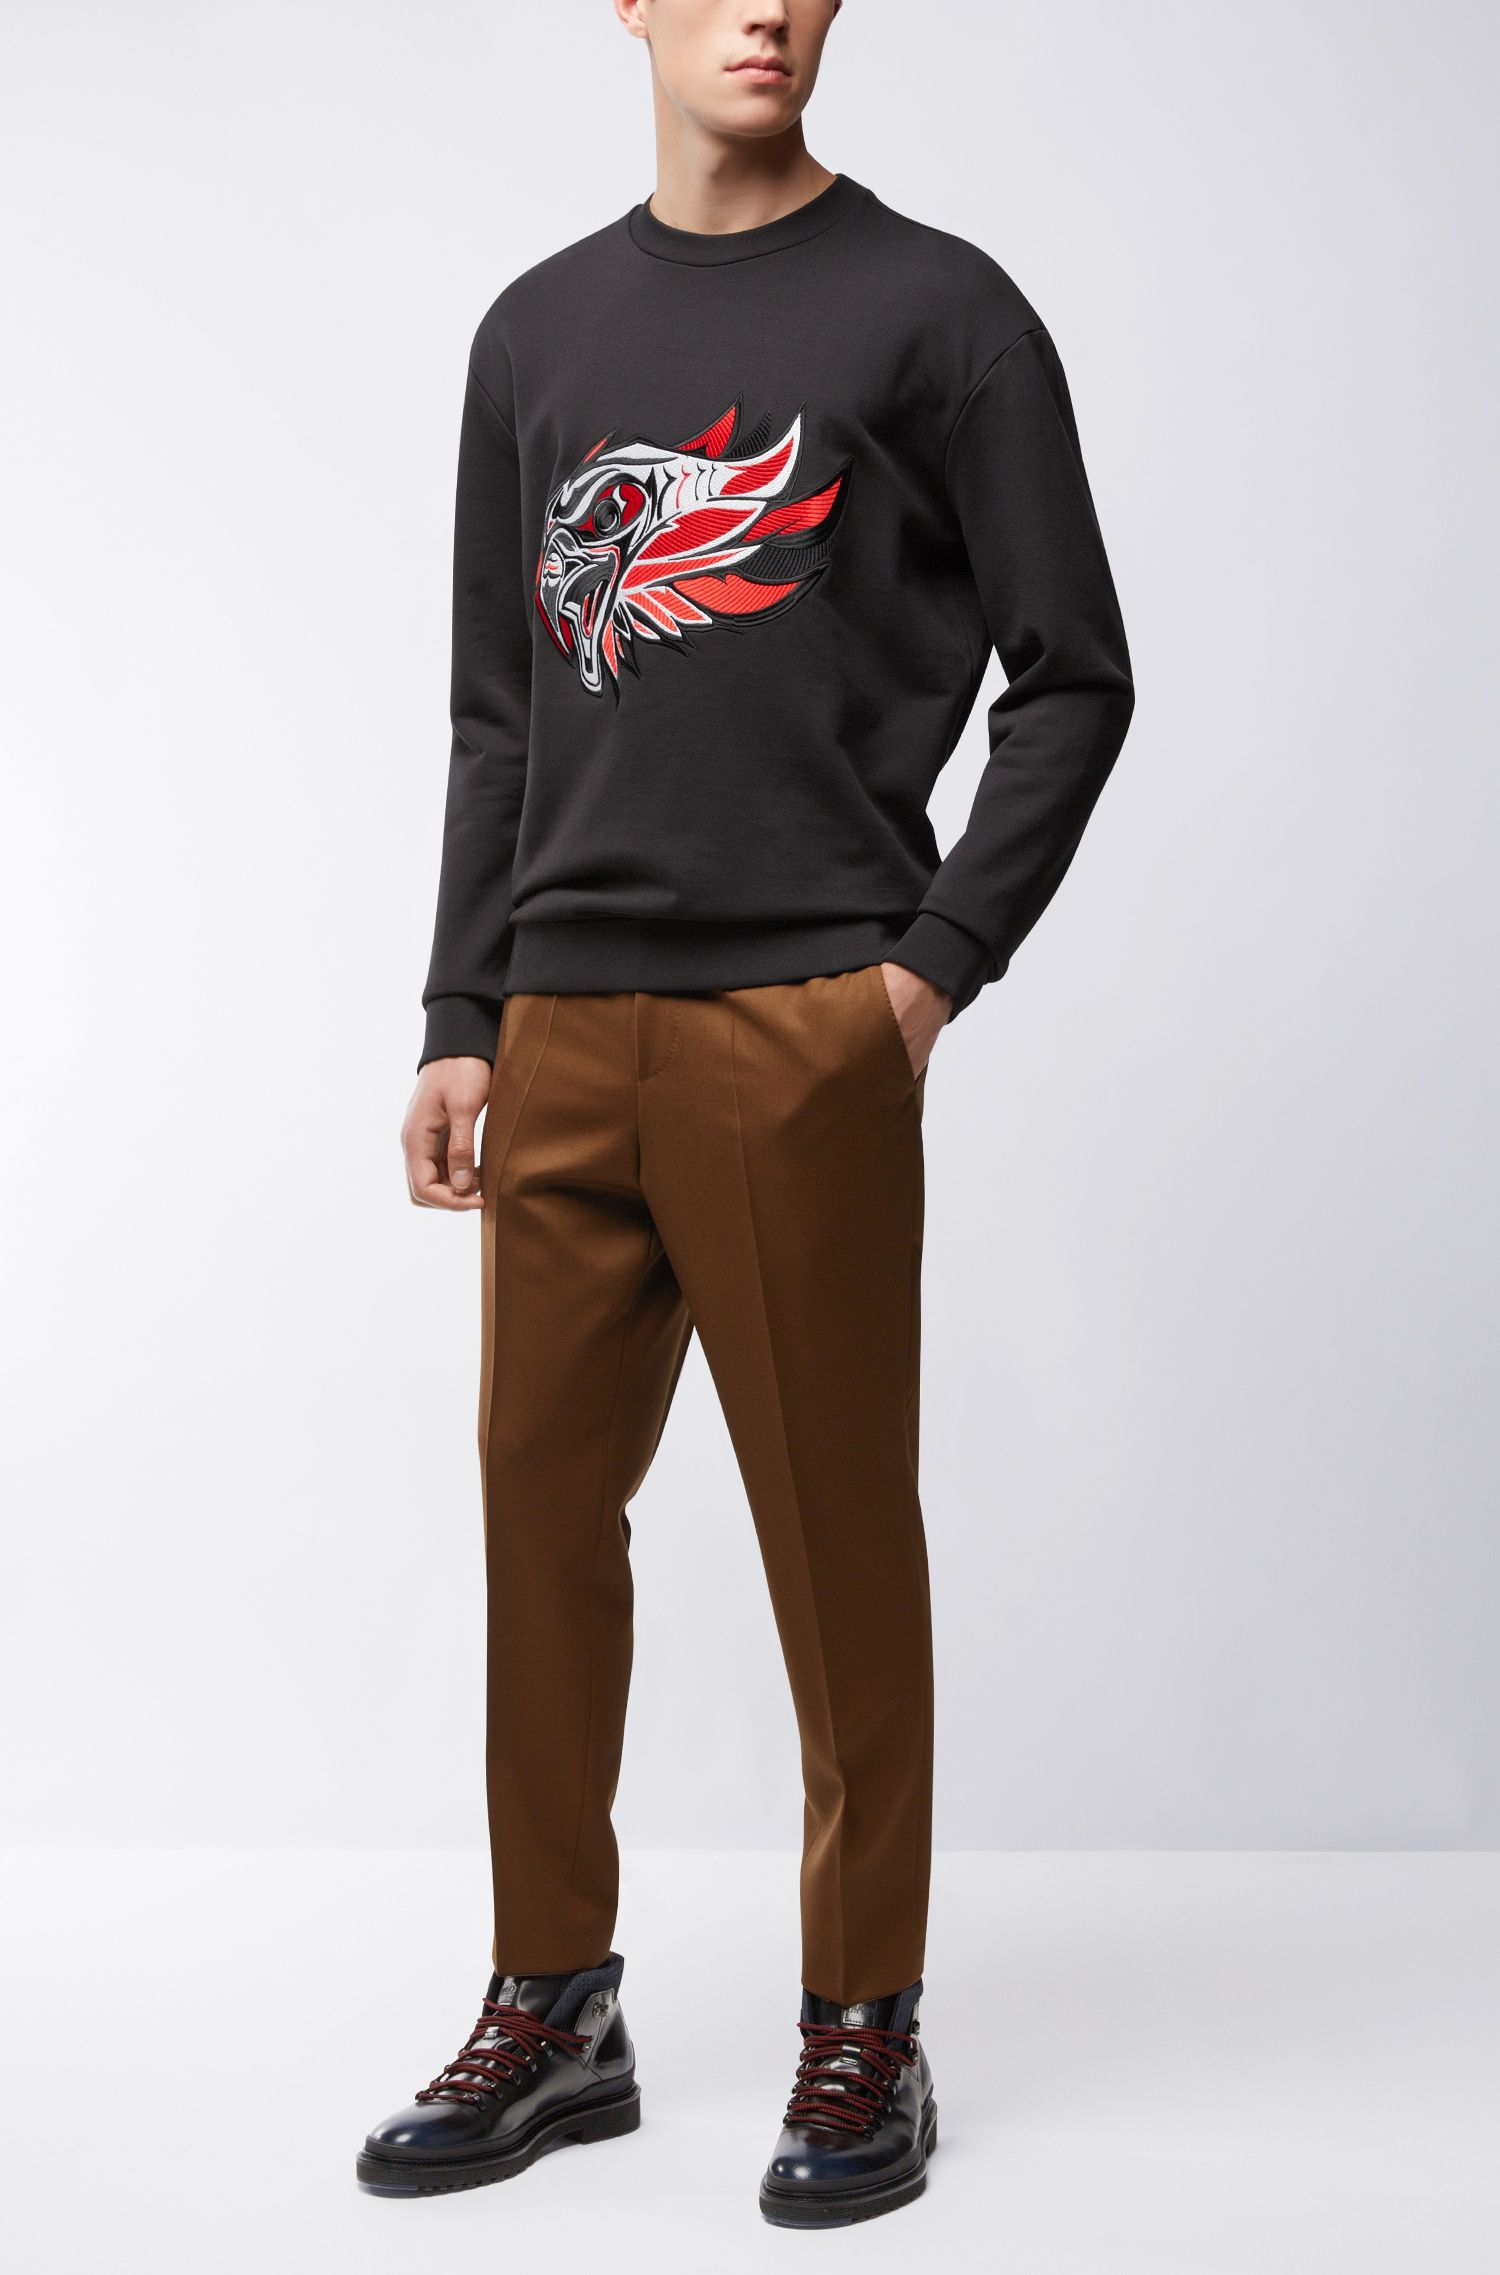 'Dohnsons' | Embroidered Cotton Sweatshirt